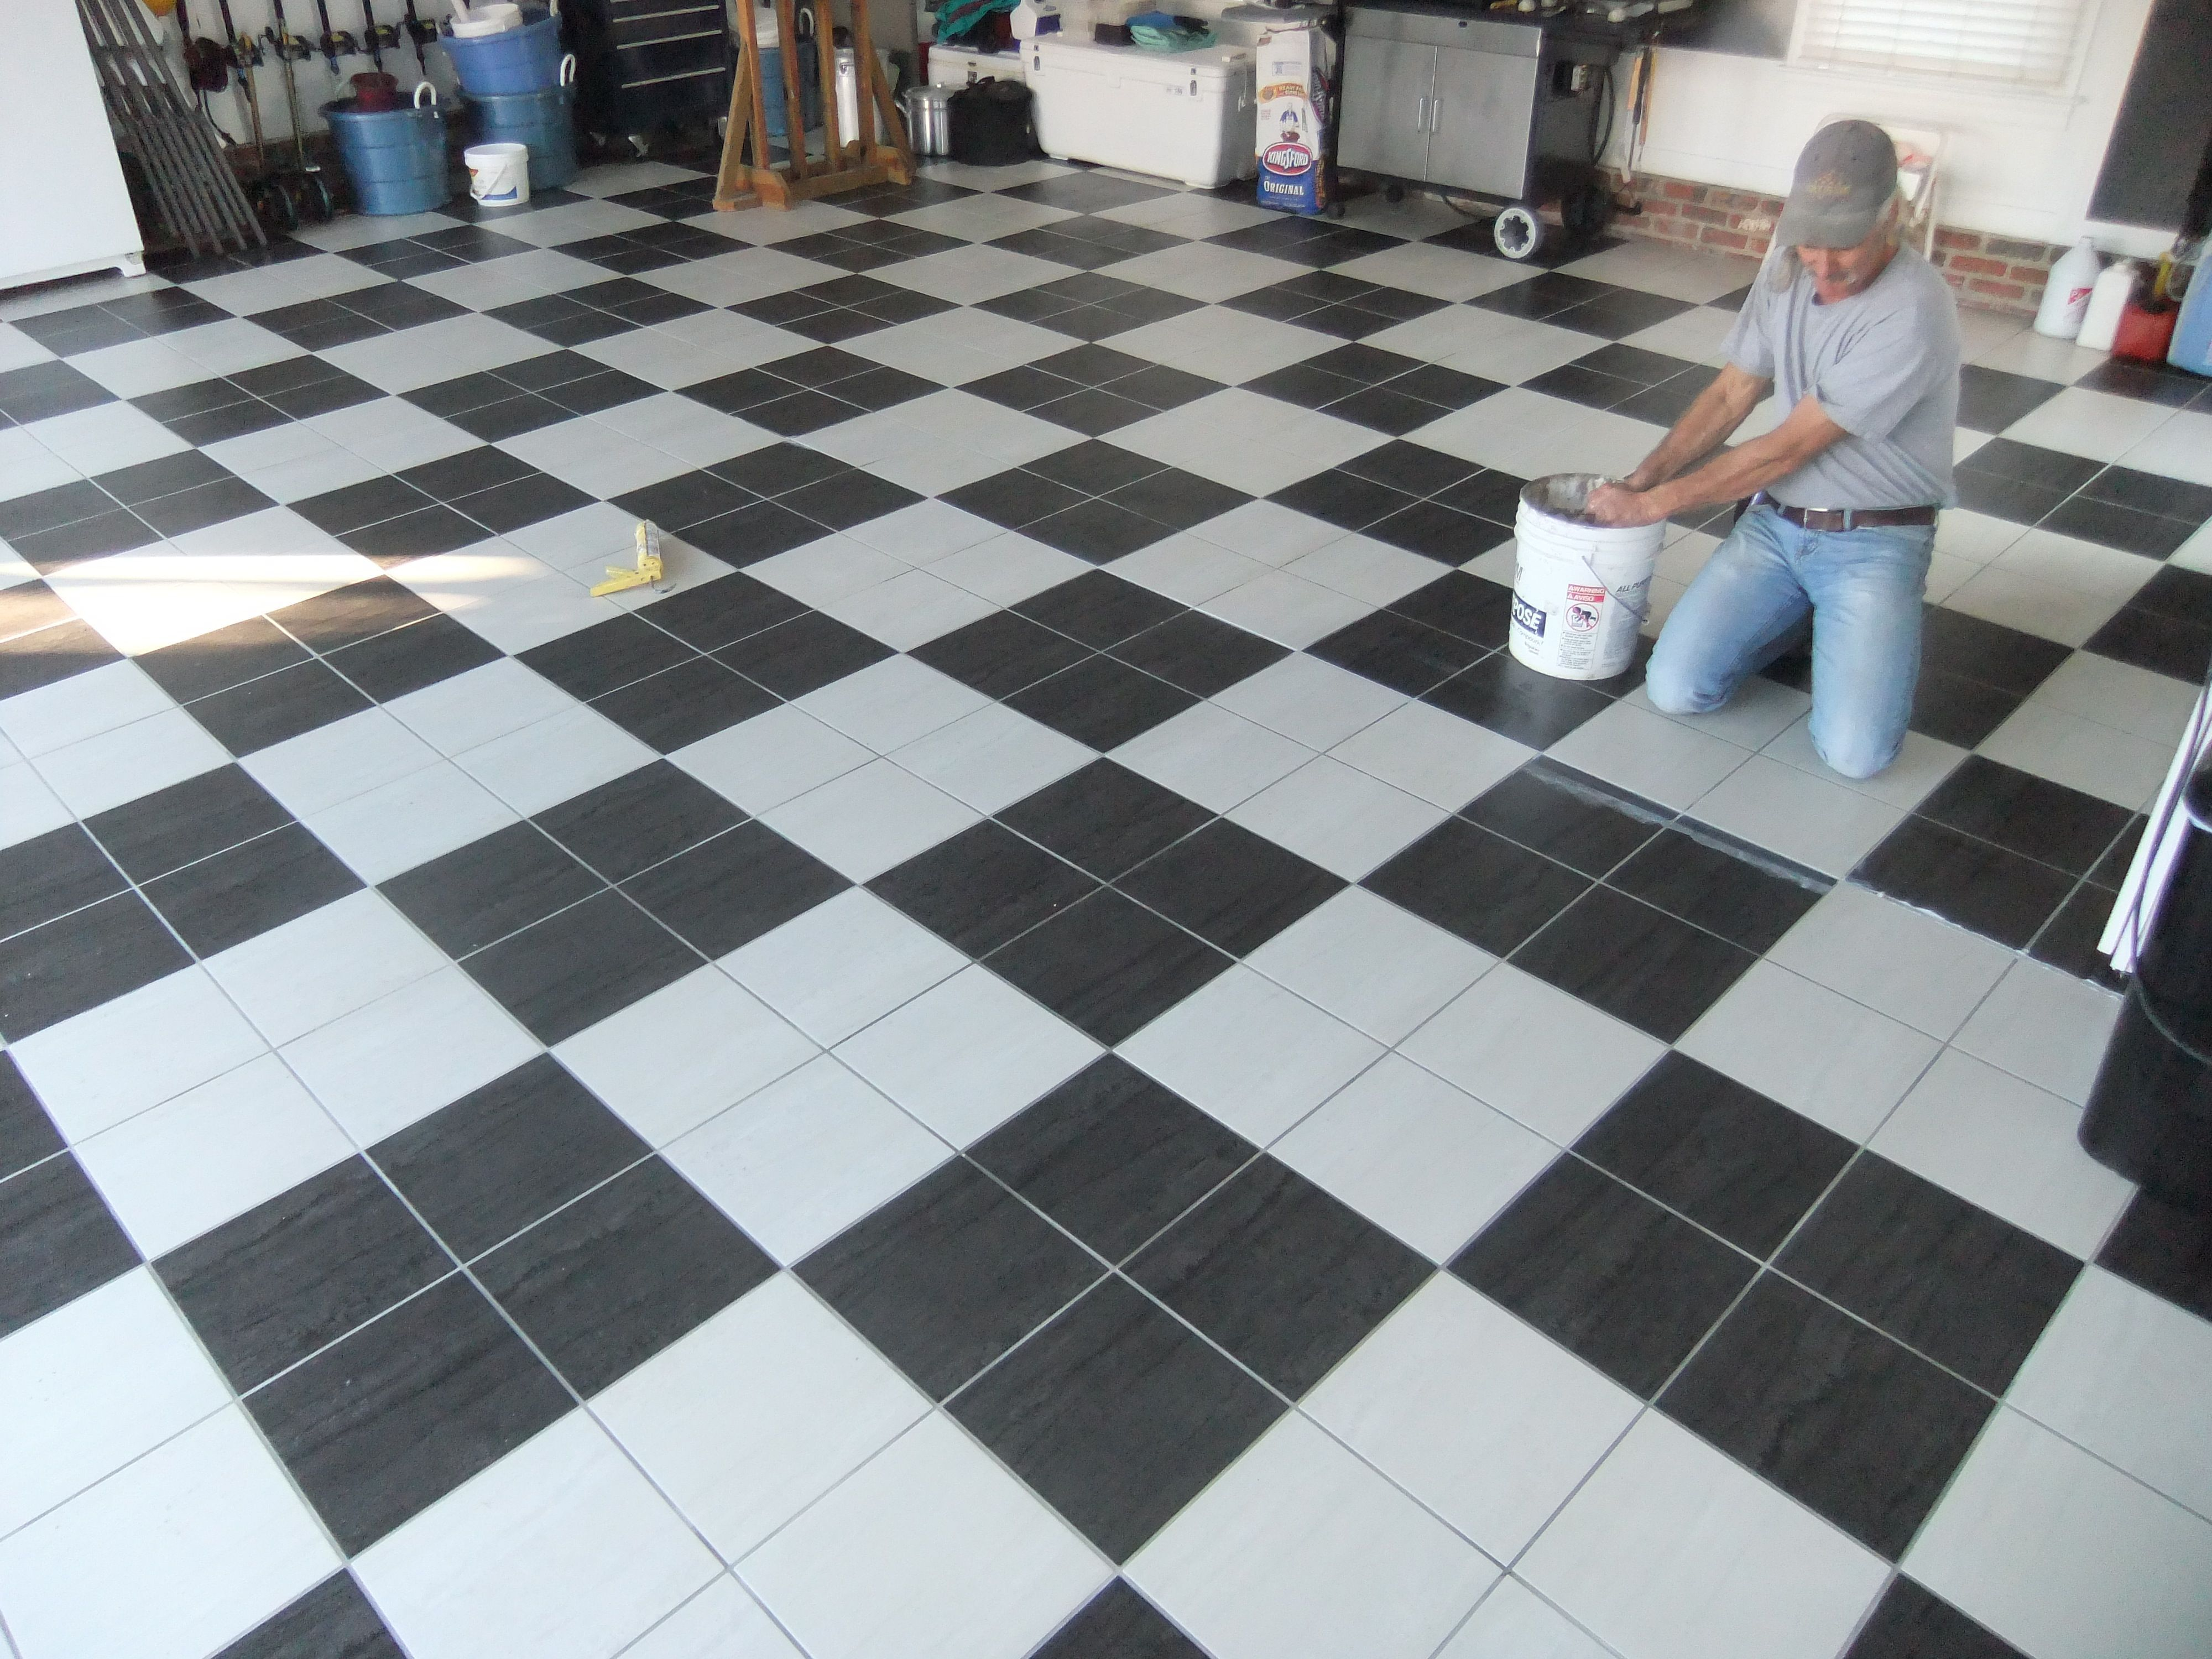 Garage Flooring Options See More Ideas About Epoxy Garage Floor Paint Best Garage Floor Paint And Epoxy Garage